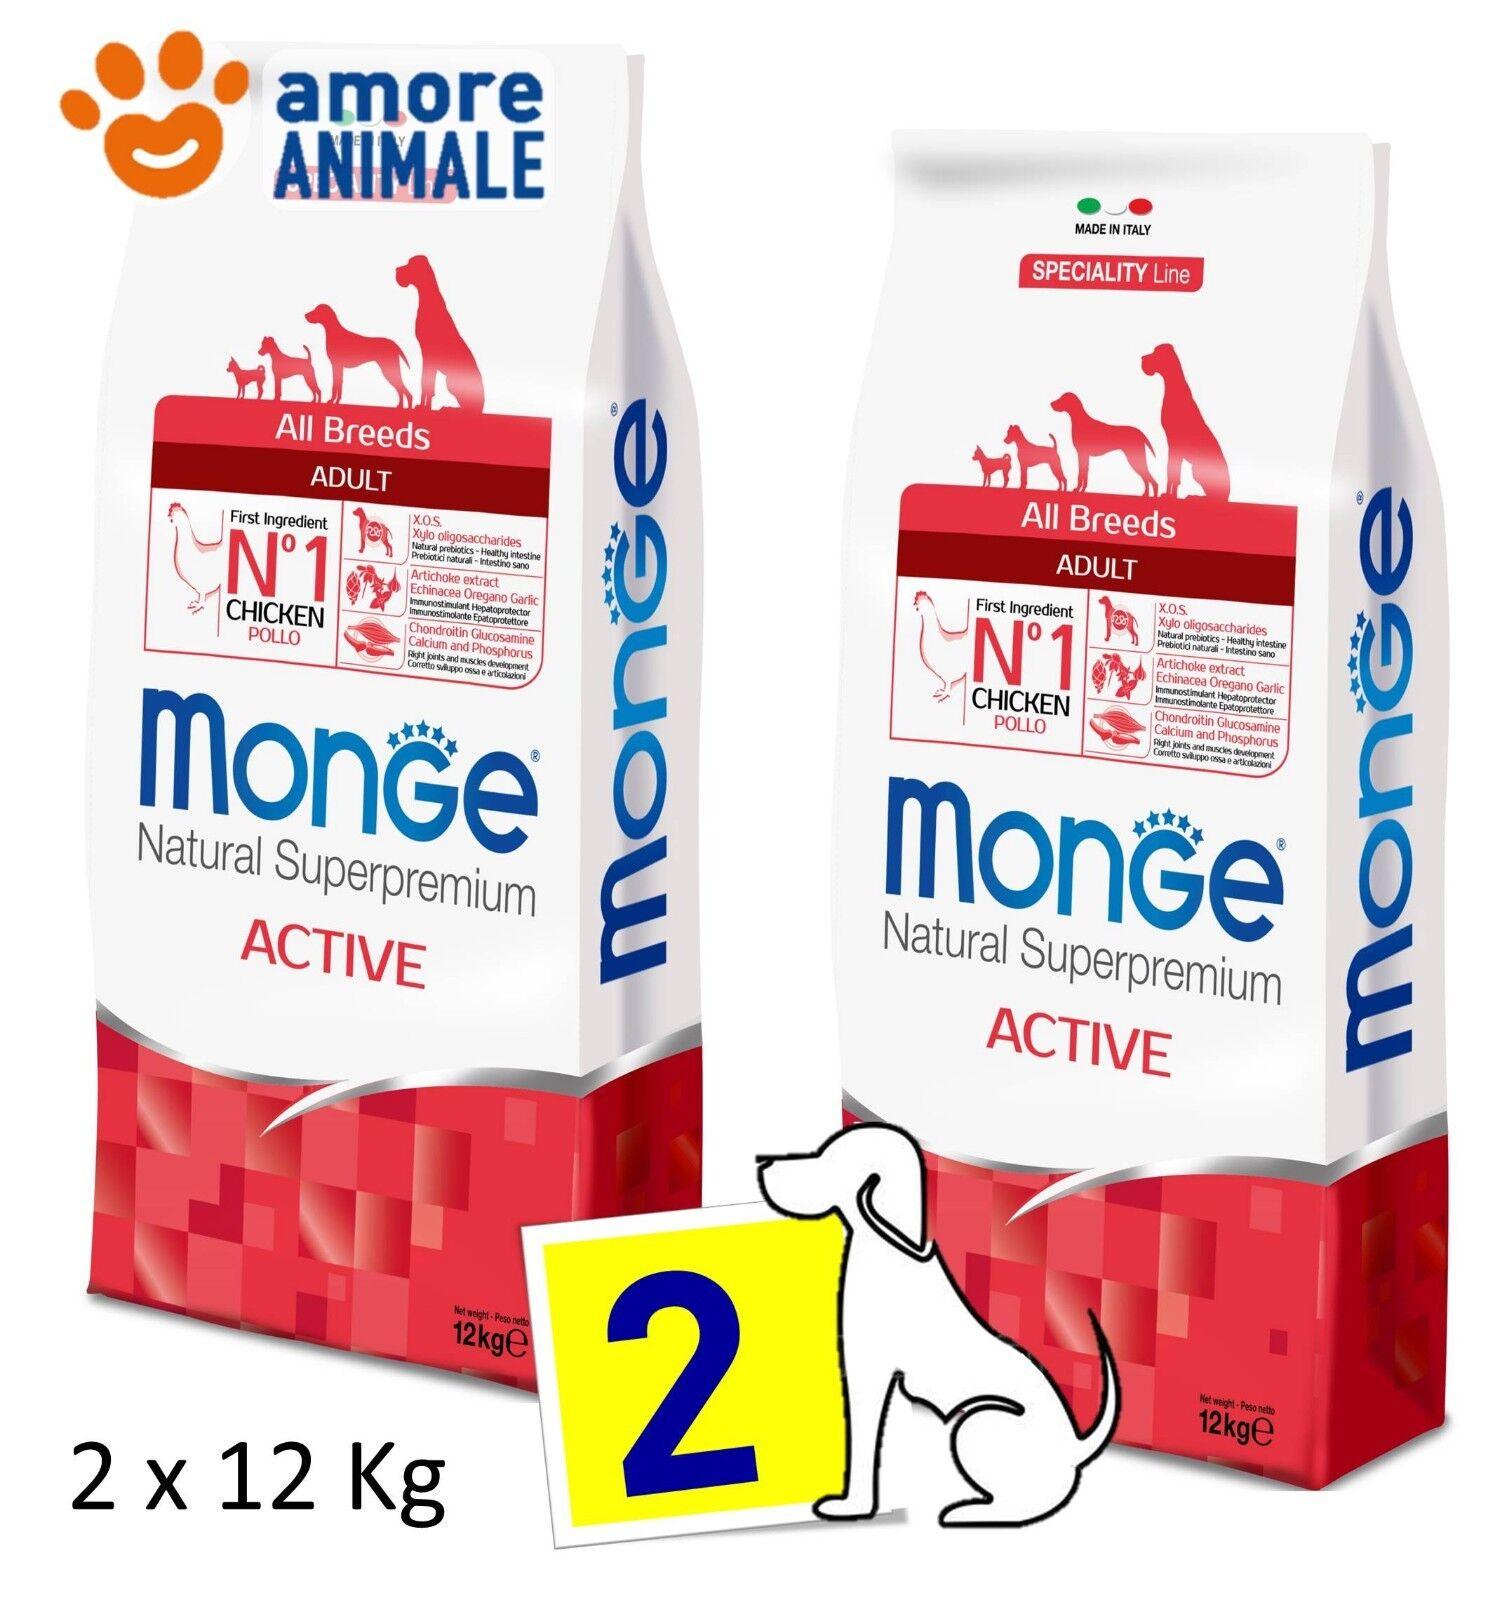 2 SAC   Monge Superpremium All Breeds Adult Active con Pollo 12 kg  Per cani